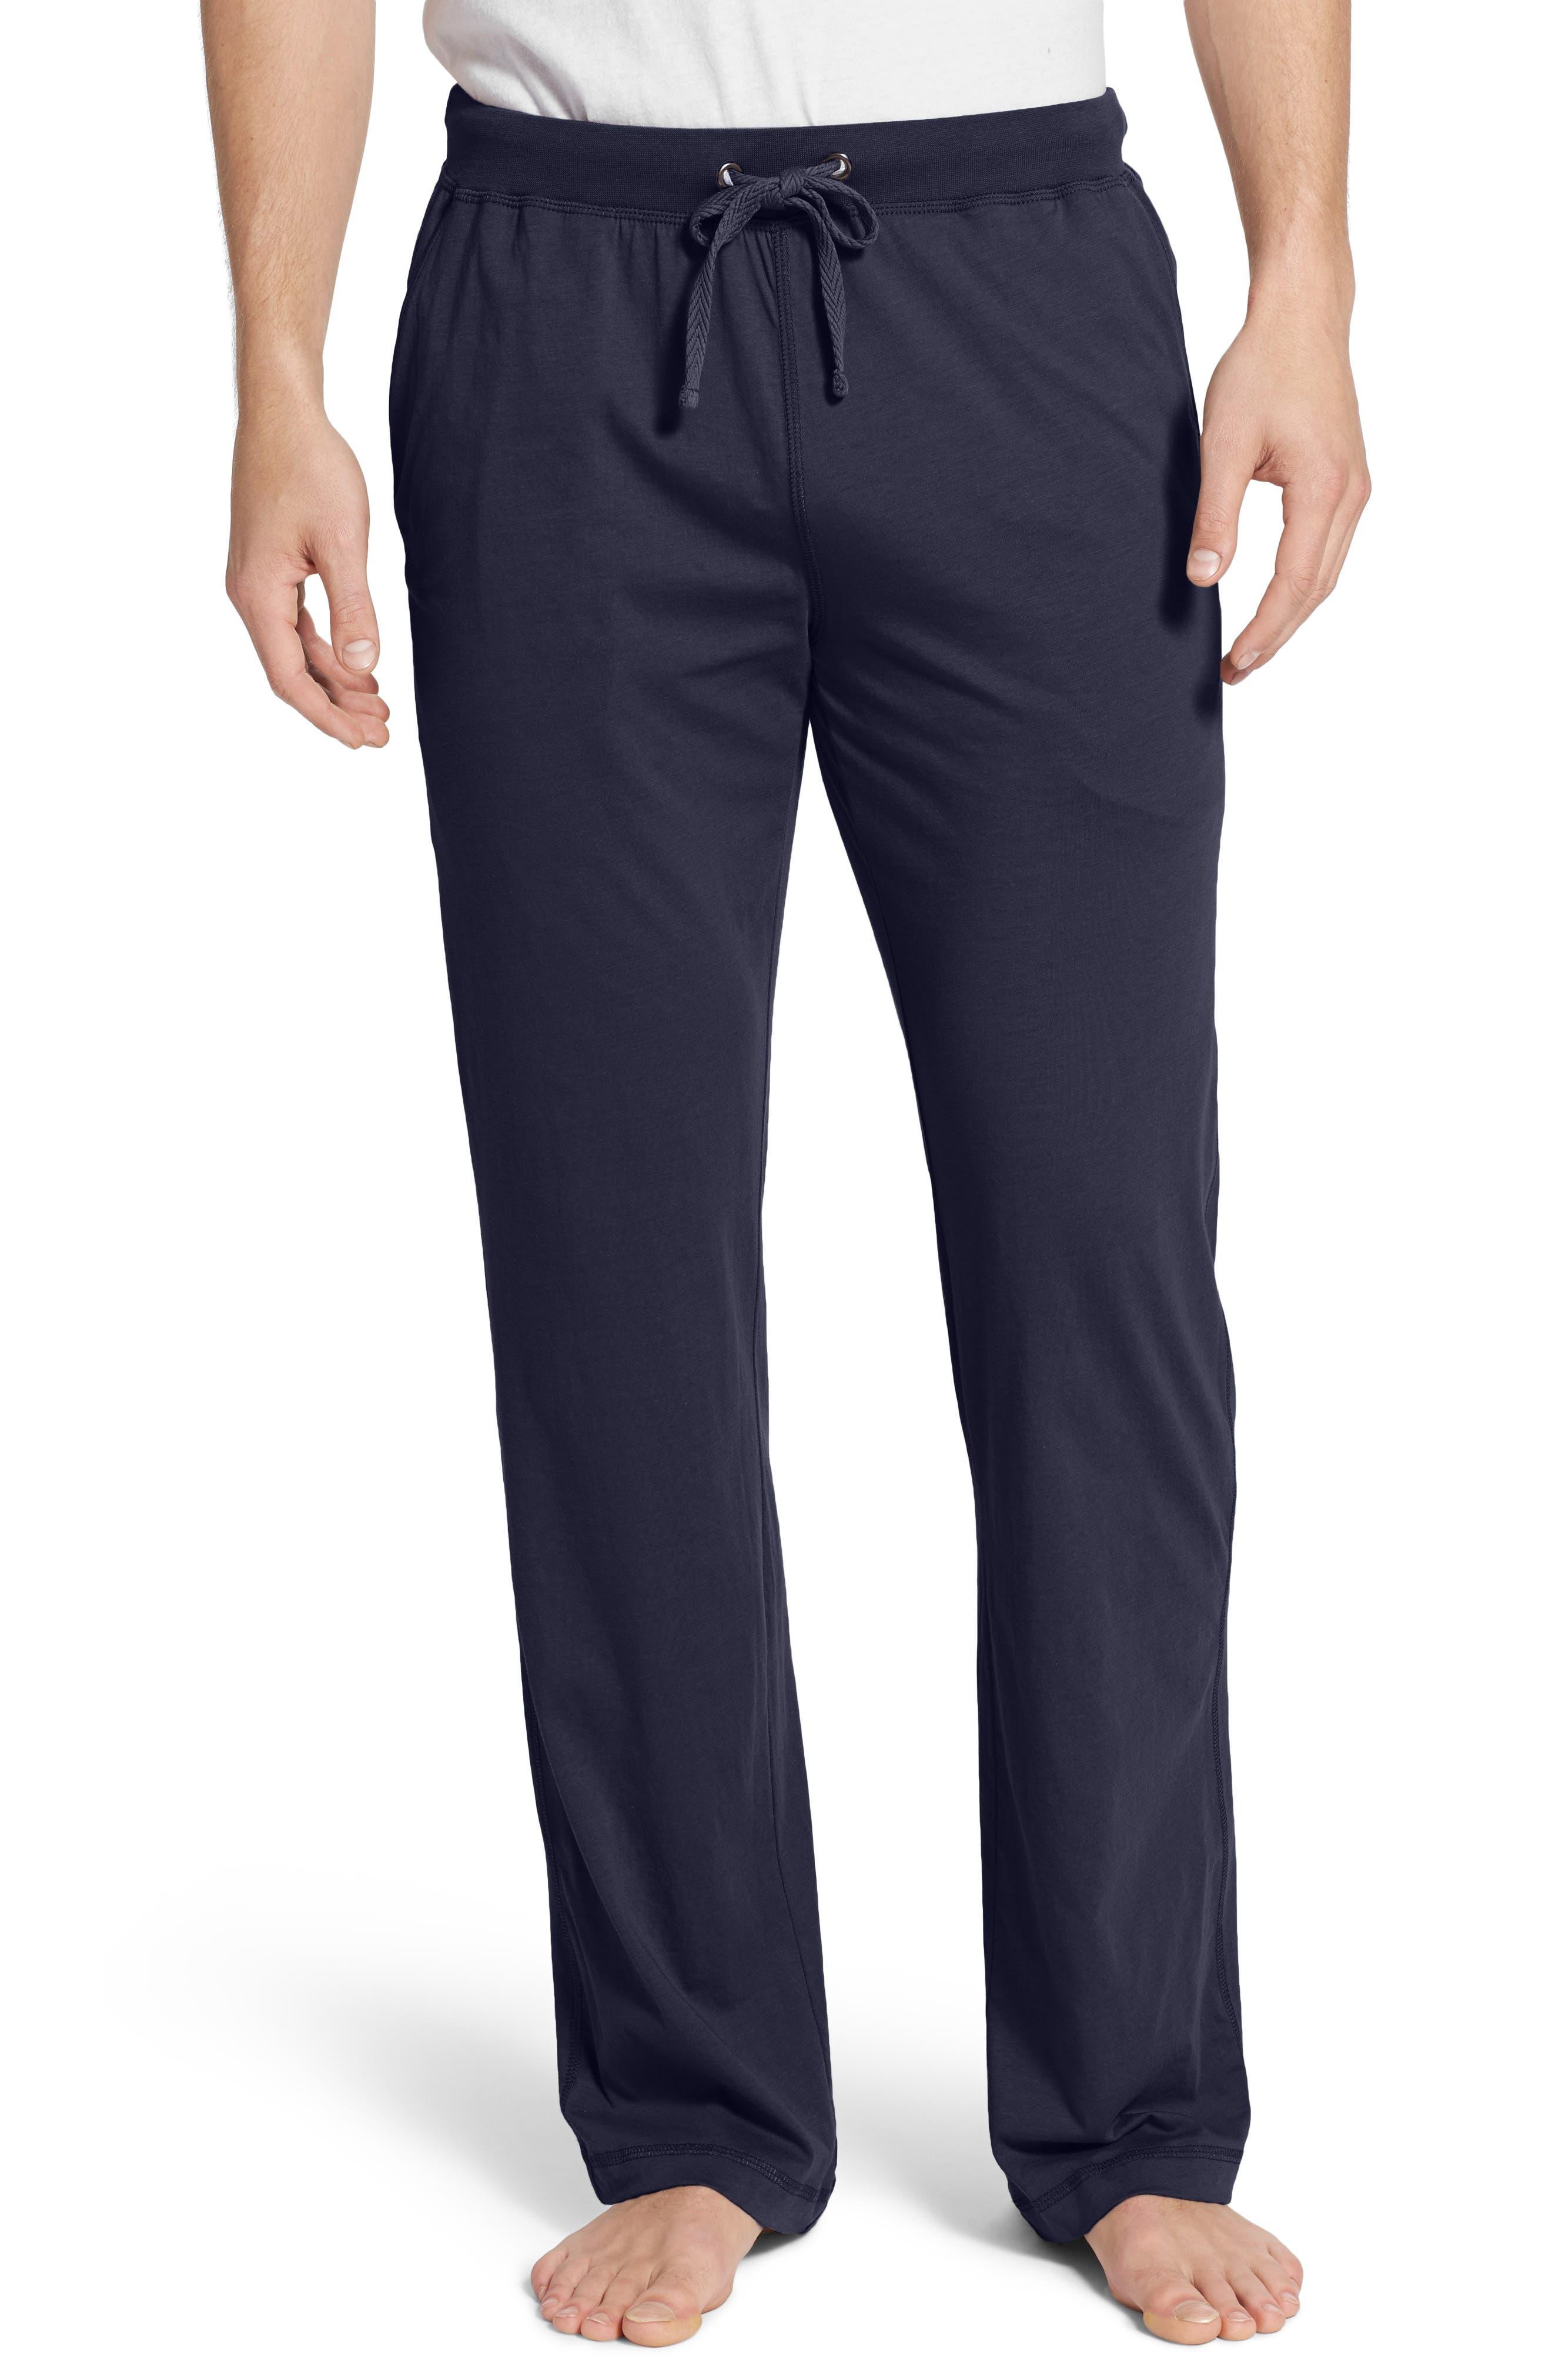 Peruvian Pima Lightweight Cotton Lounge Pants,                             Main thumbnail 1, color,                             NAVY